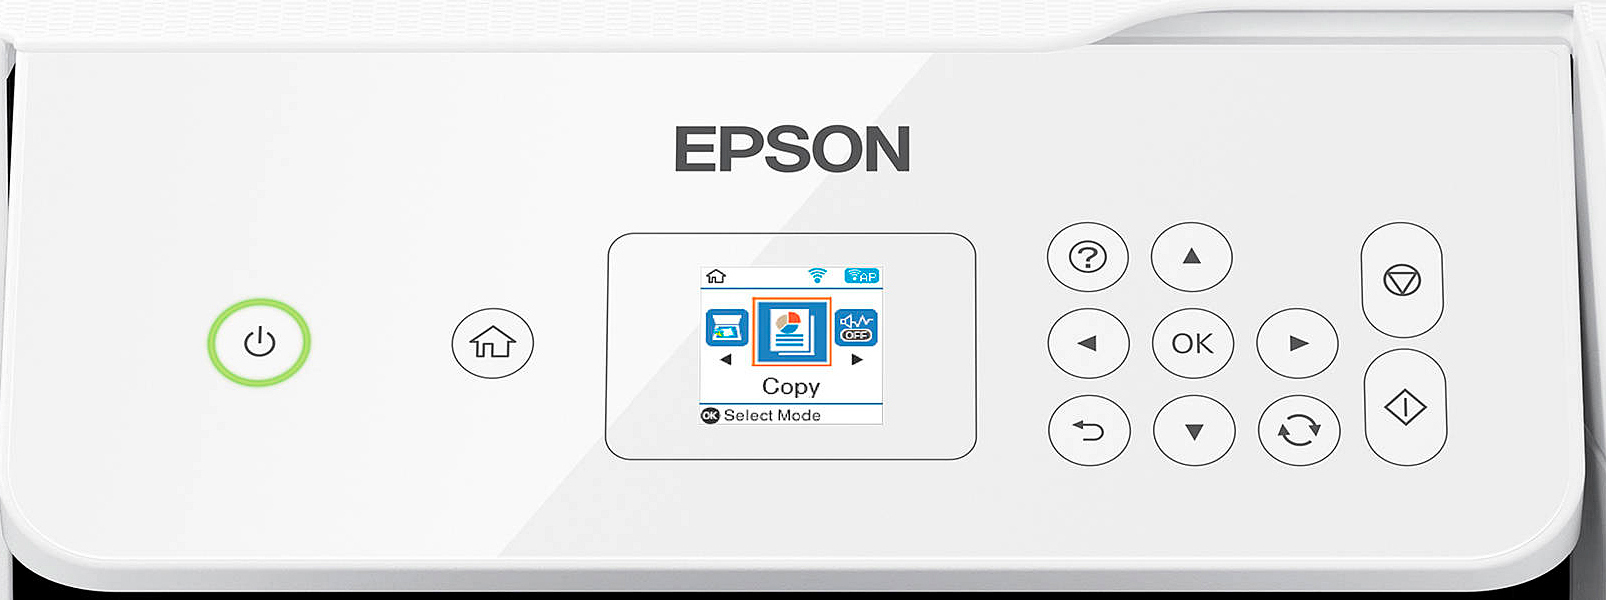 Epson EcoTank ET-2720 All-In-One Cartridge-Free Supertank